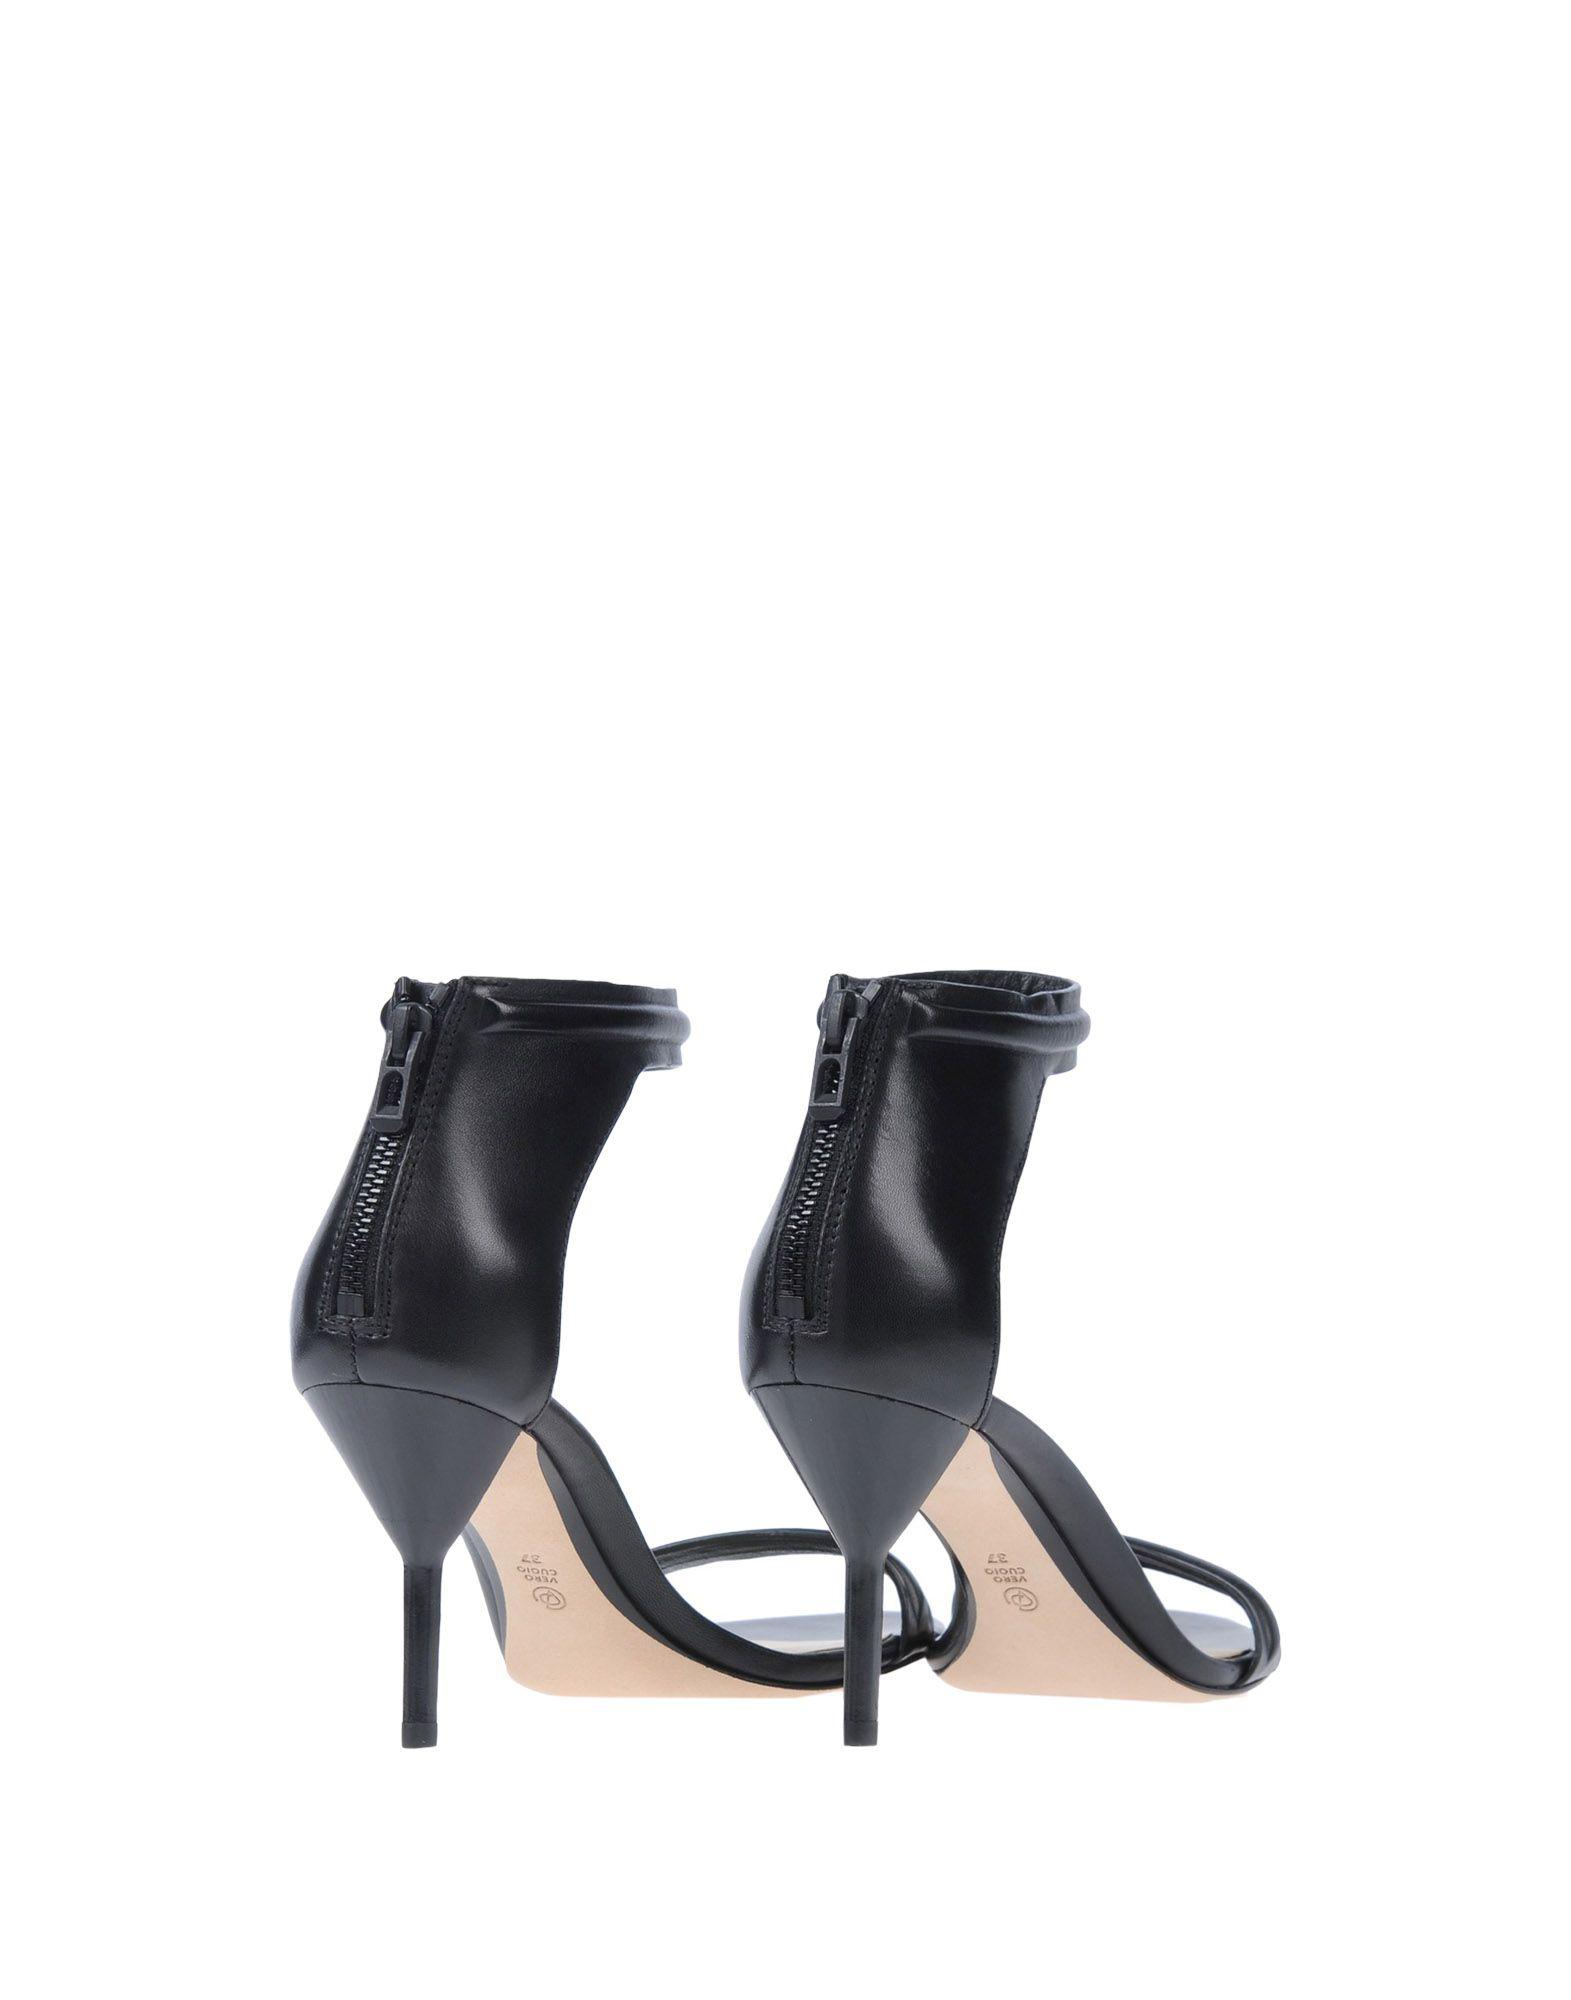 Rabatt Schuhe 3.1 Phillip Lim 11511136ET Sandalen Damen  11511136ET Lim 4a7f34